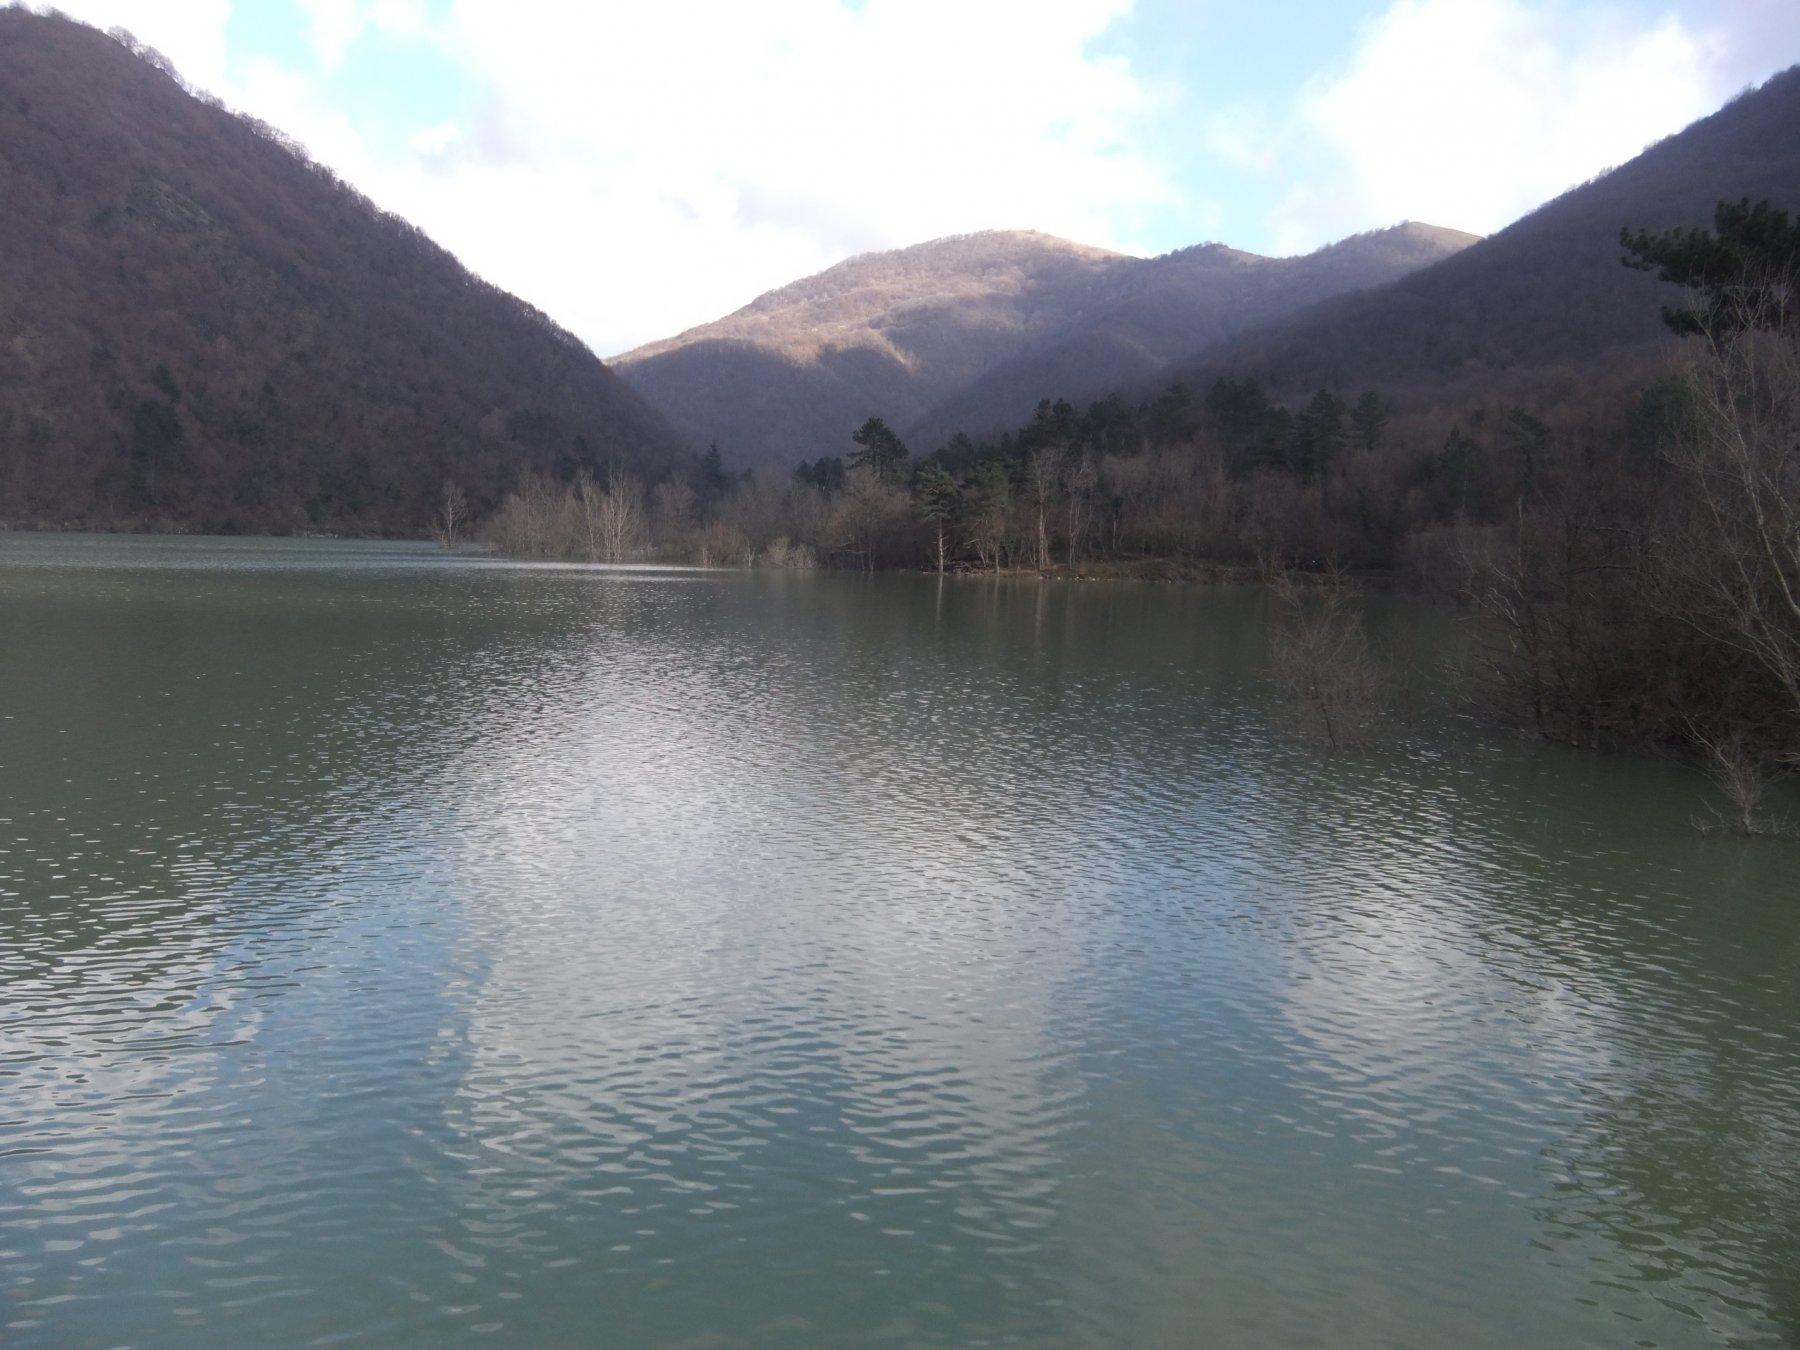 Sulla diga del Lago di Valnoci